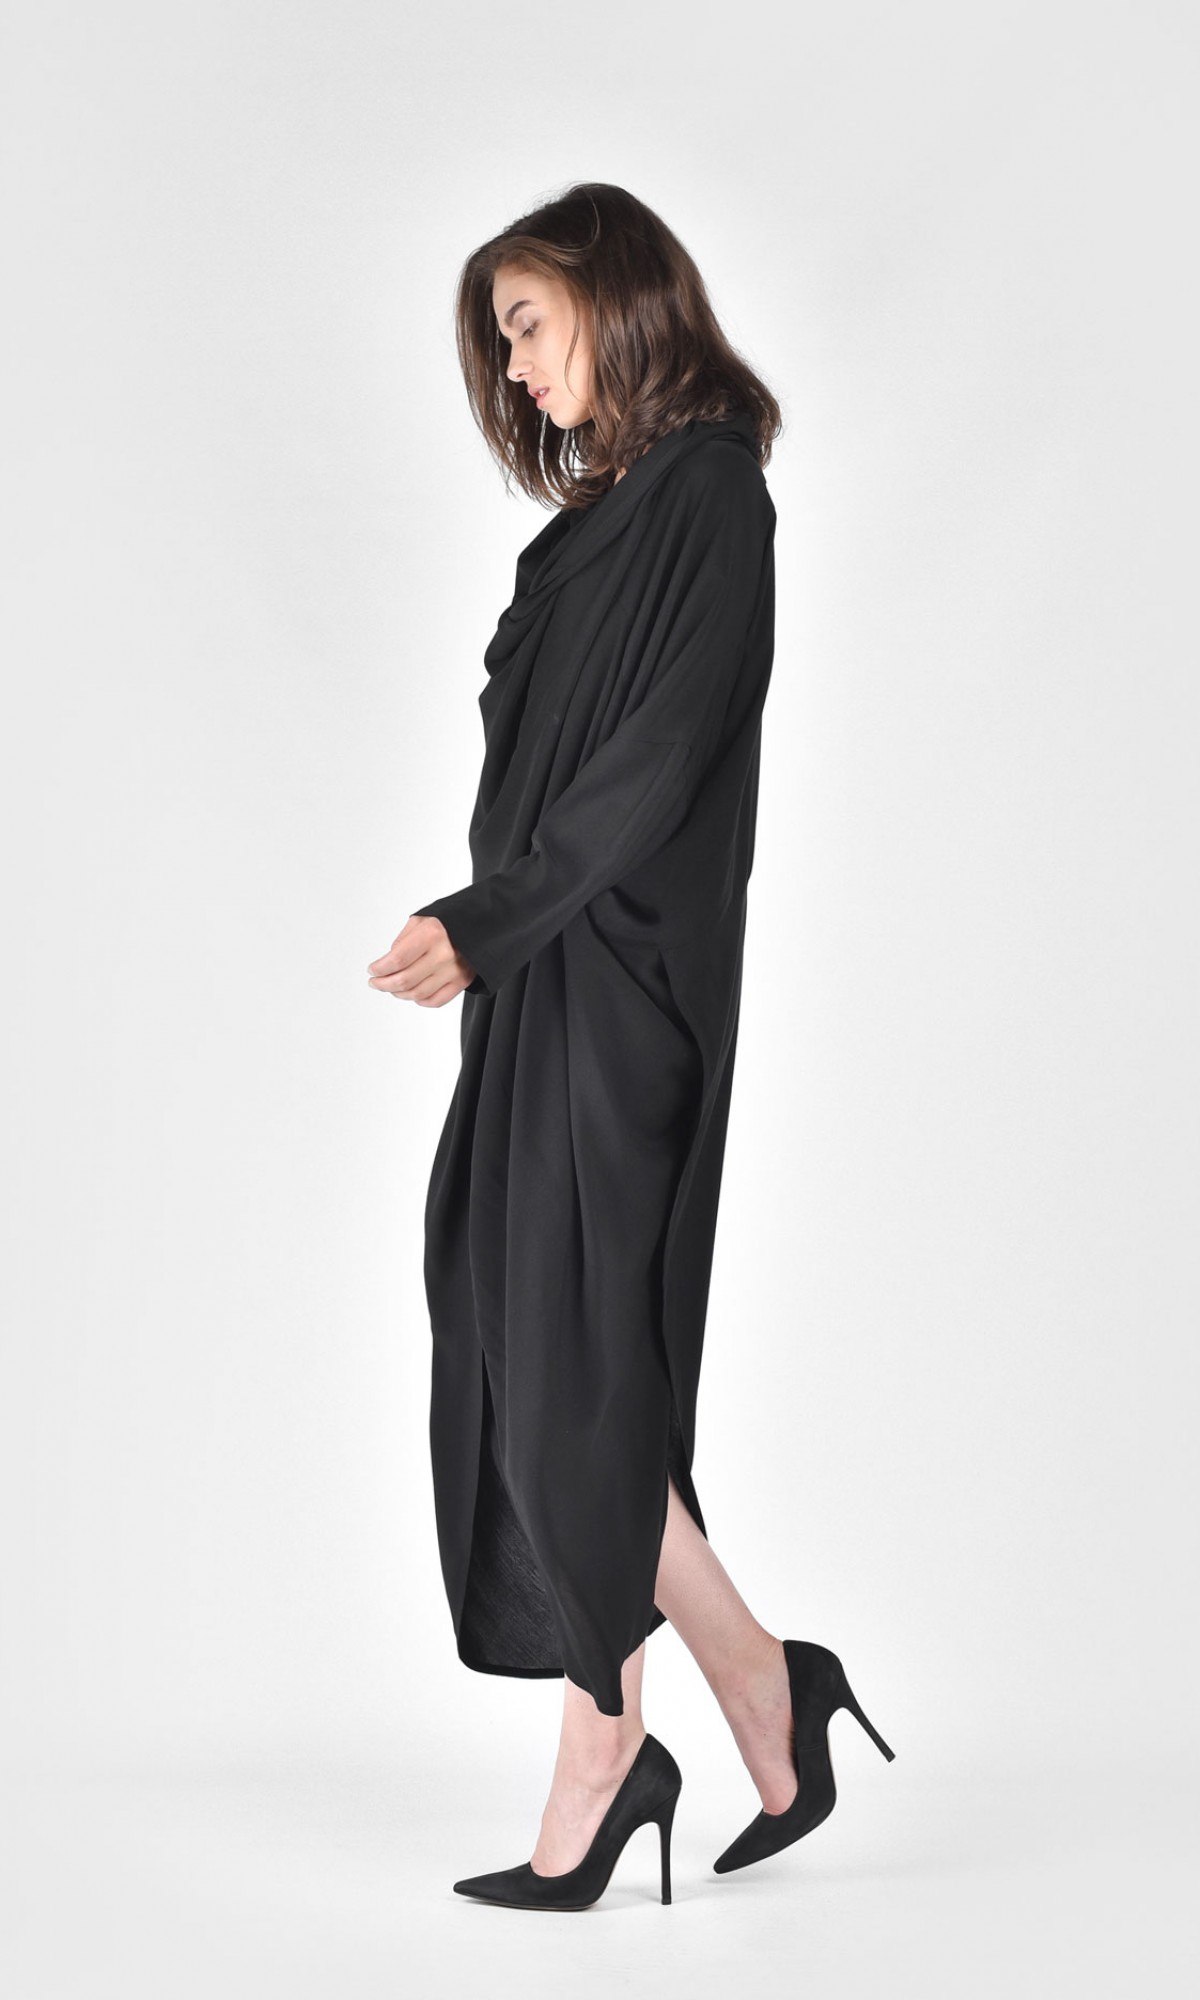 06368b5f4c9d45 ... Extravagant Shirt Hooded Dress A03730 ...